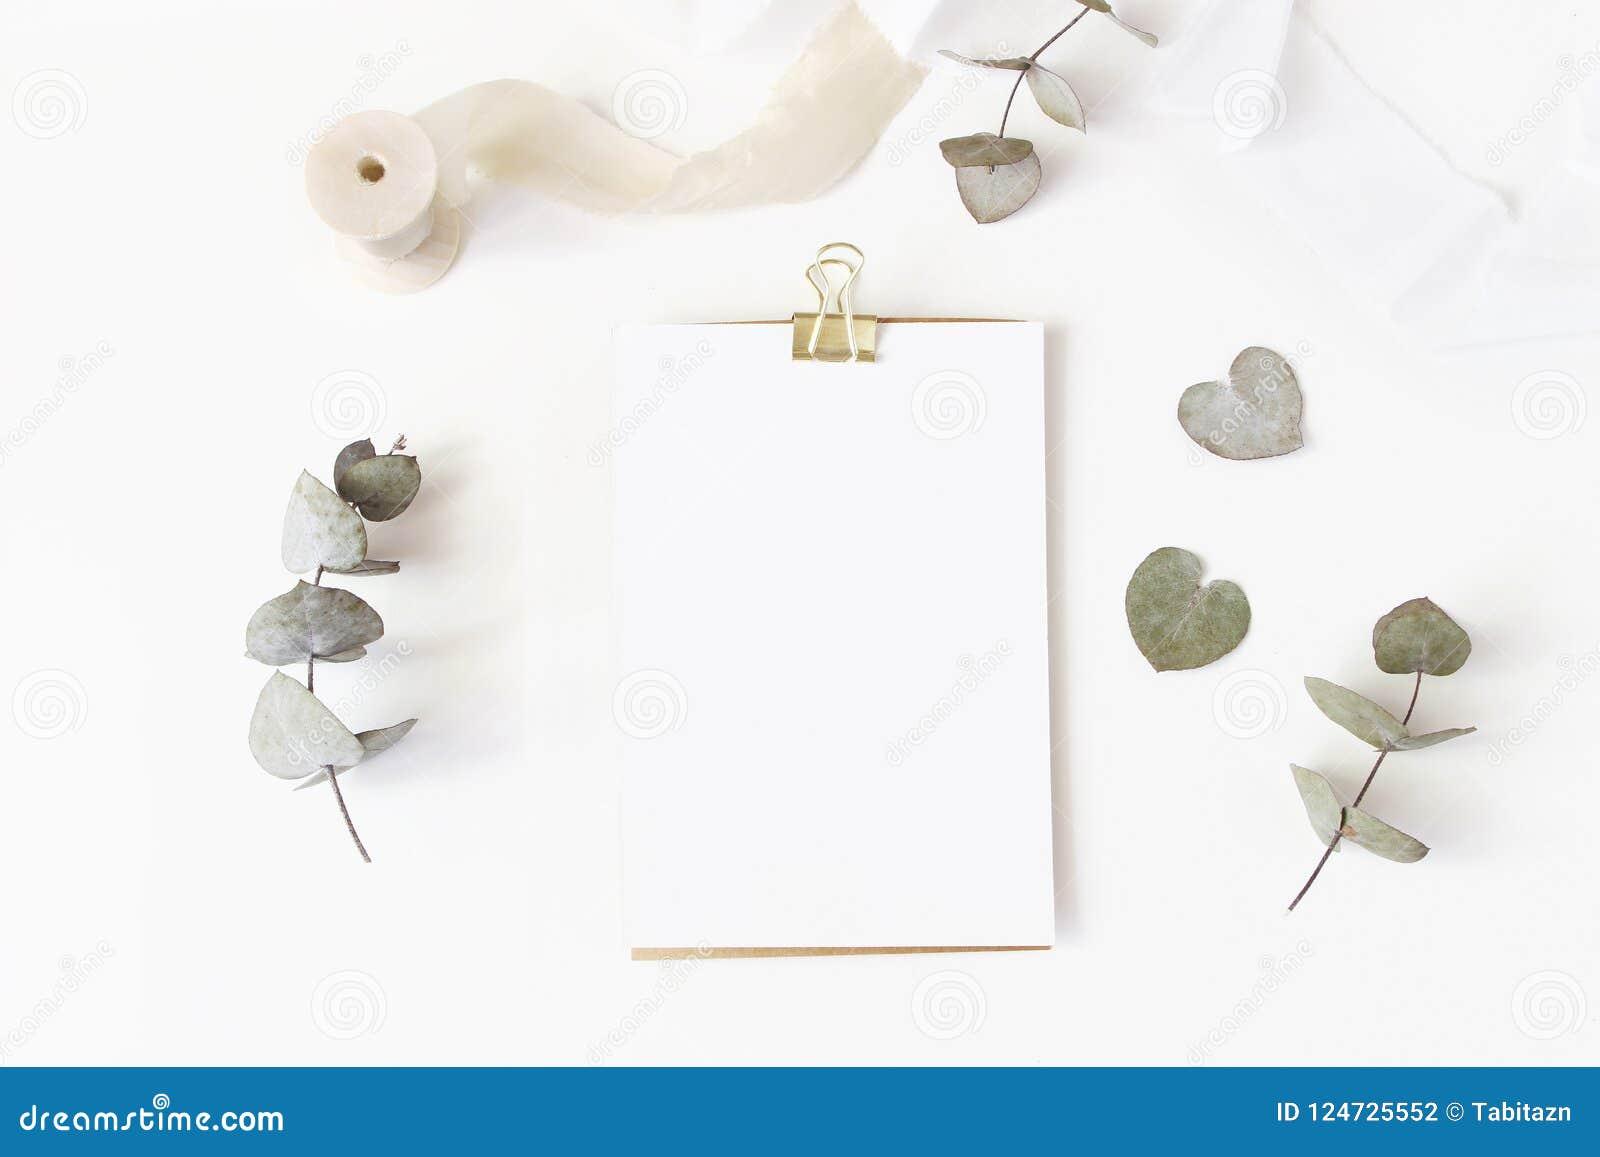 Feminine wedding desktop stationery mockup with blank greeting card, dry eucalyptus leaves, silk ribbon and golden